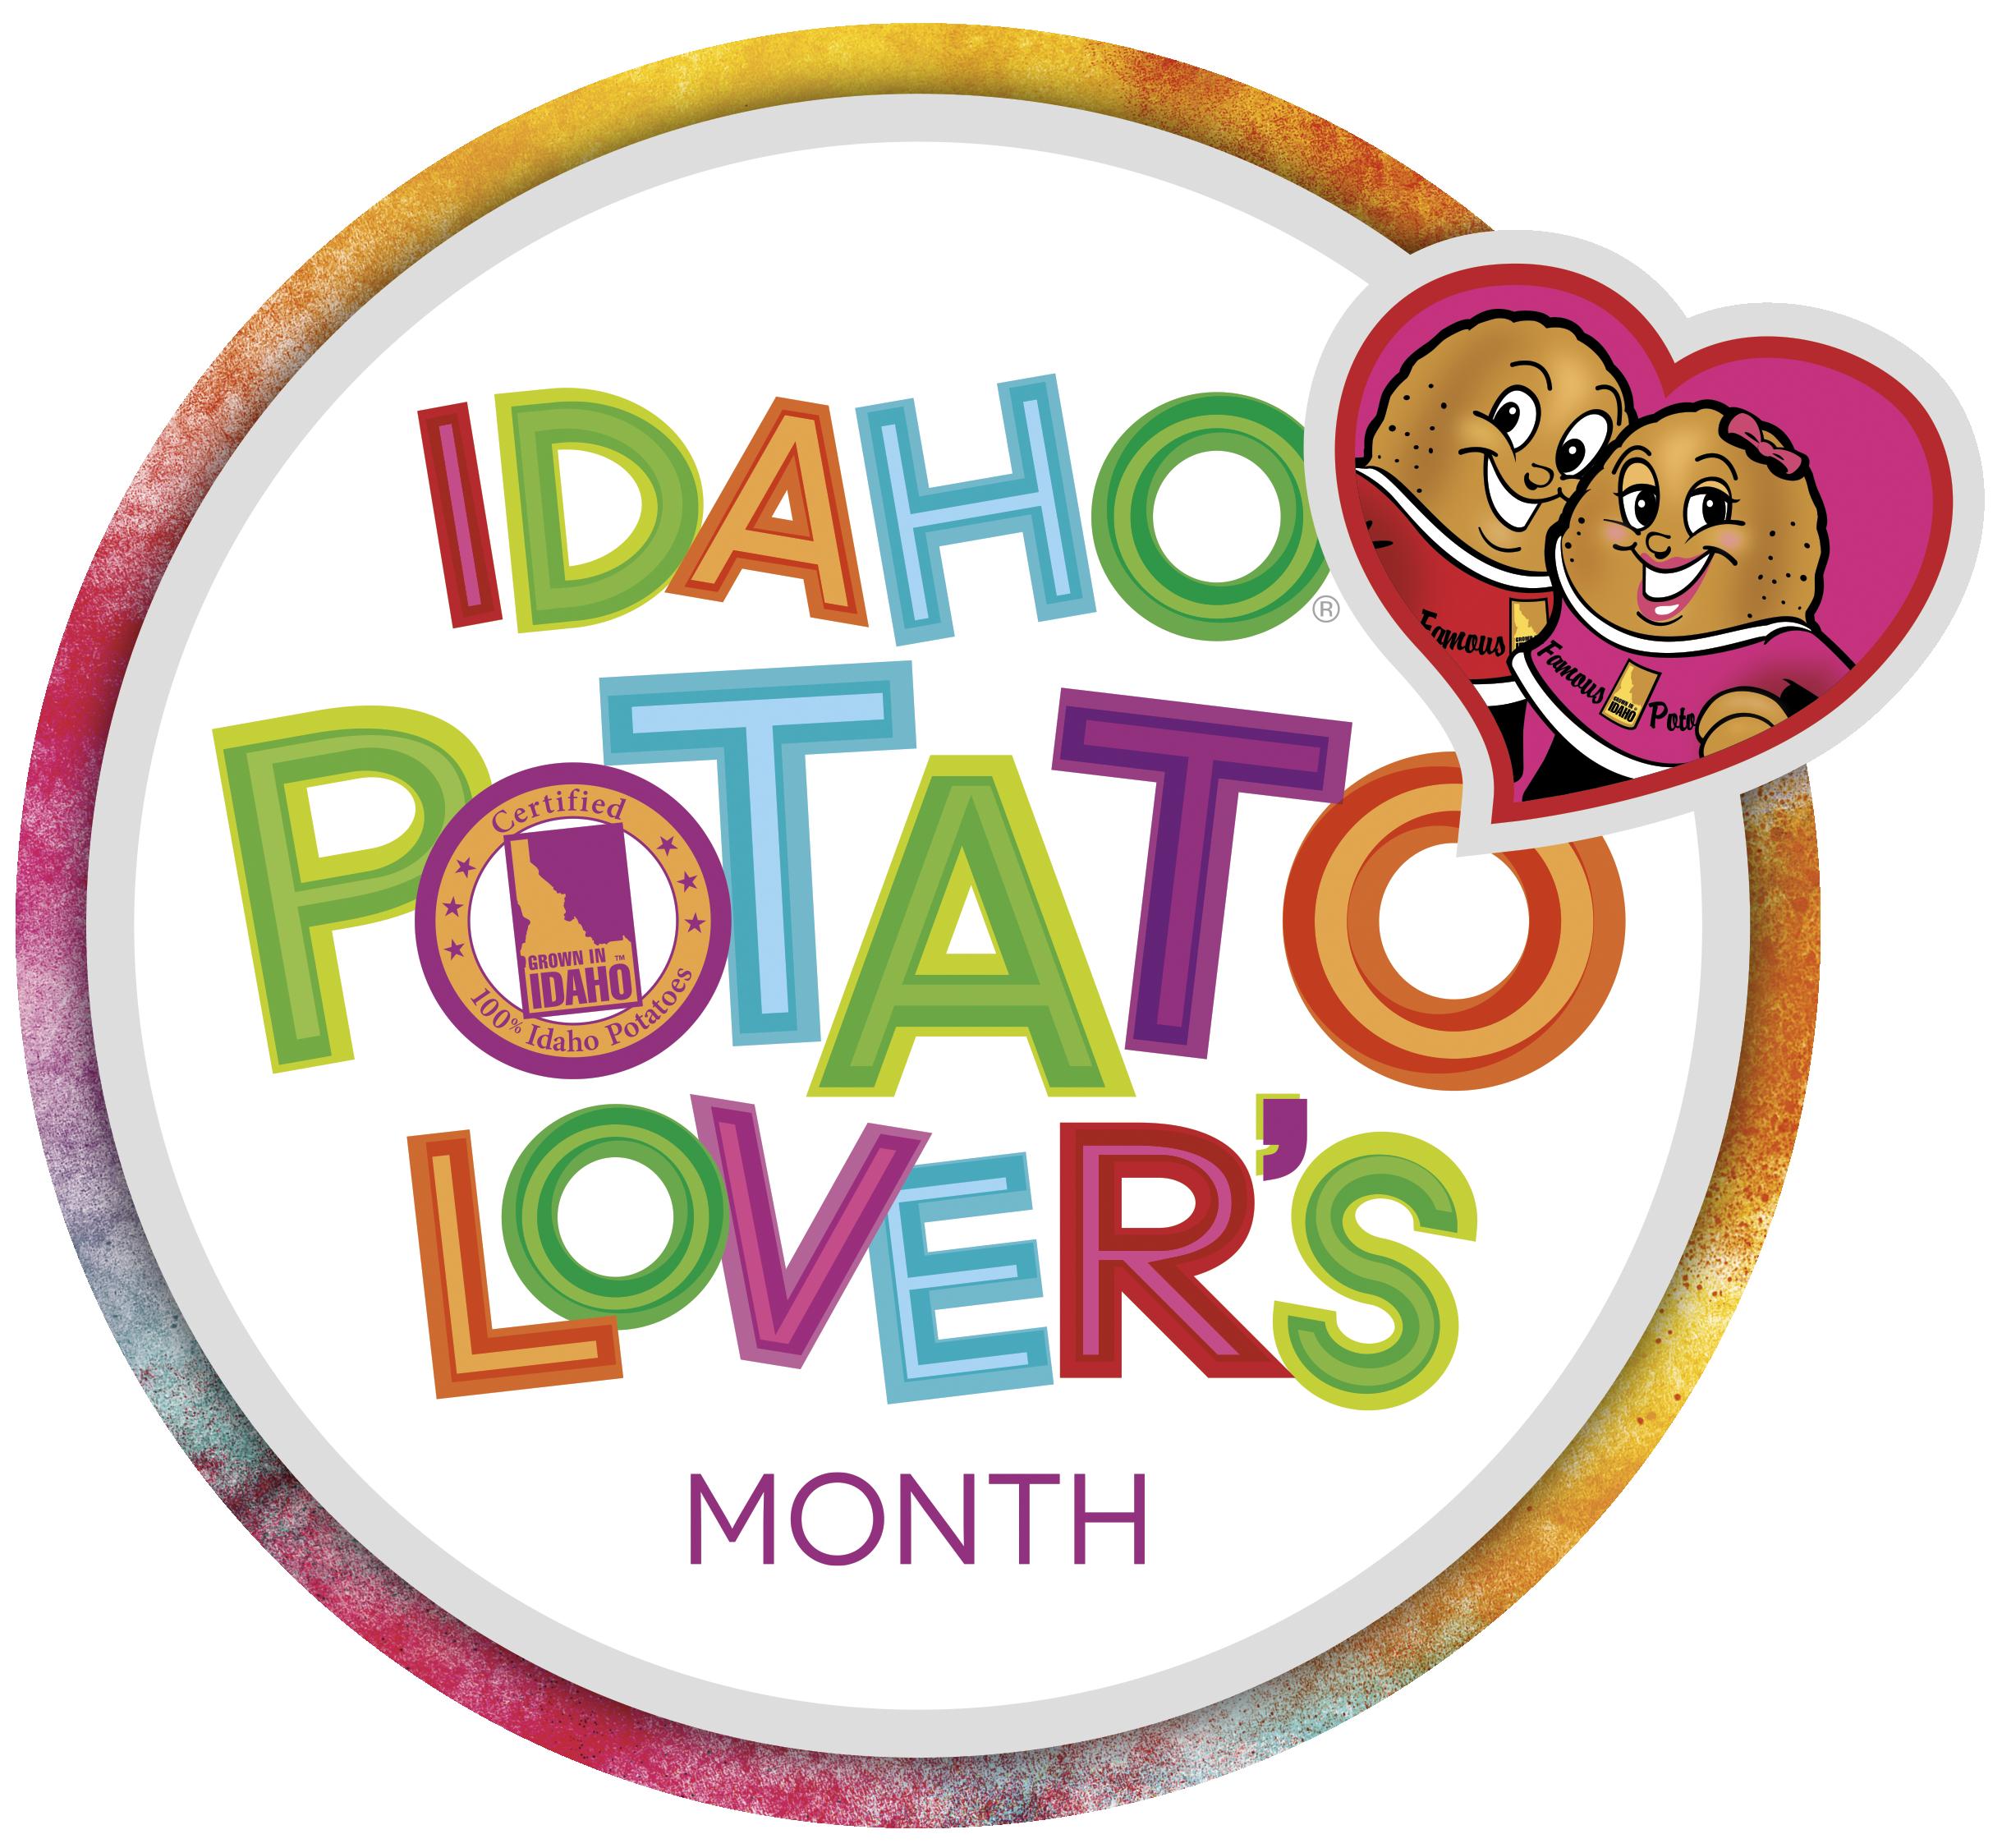 Potato clipart single. Idaho commission